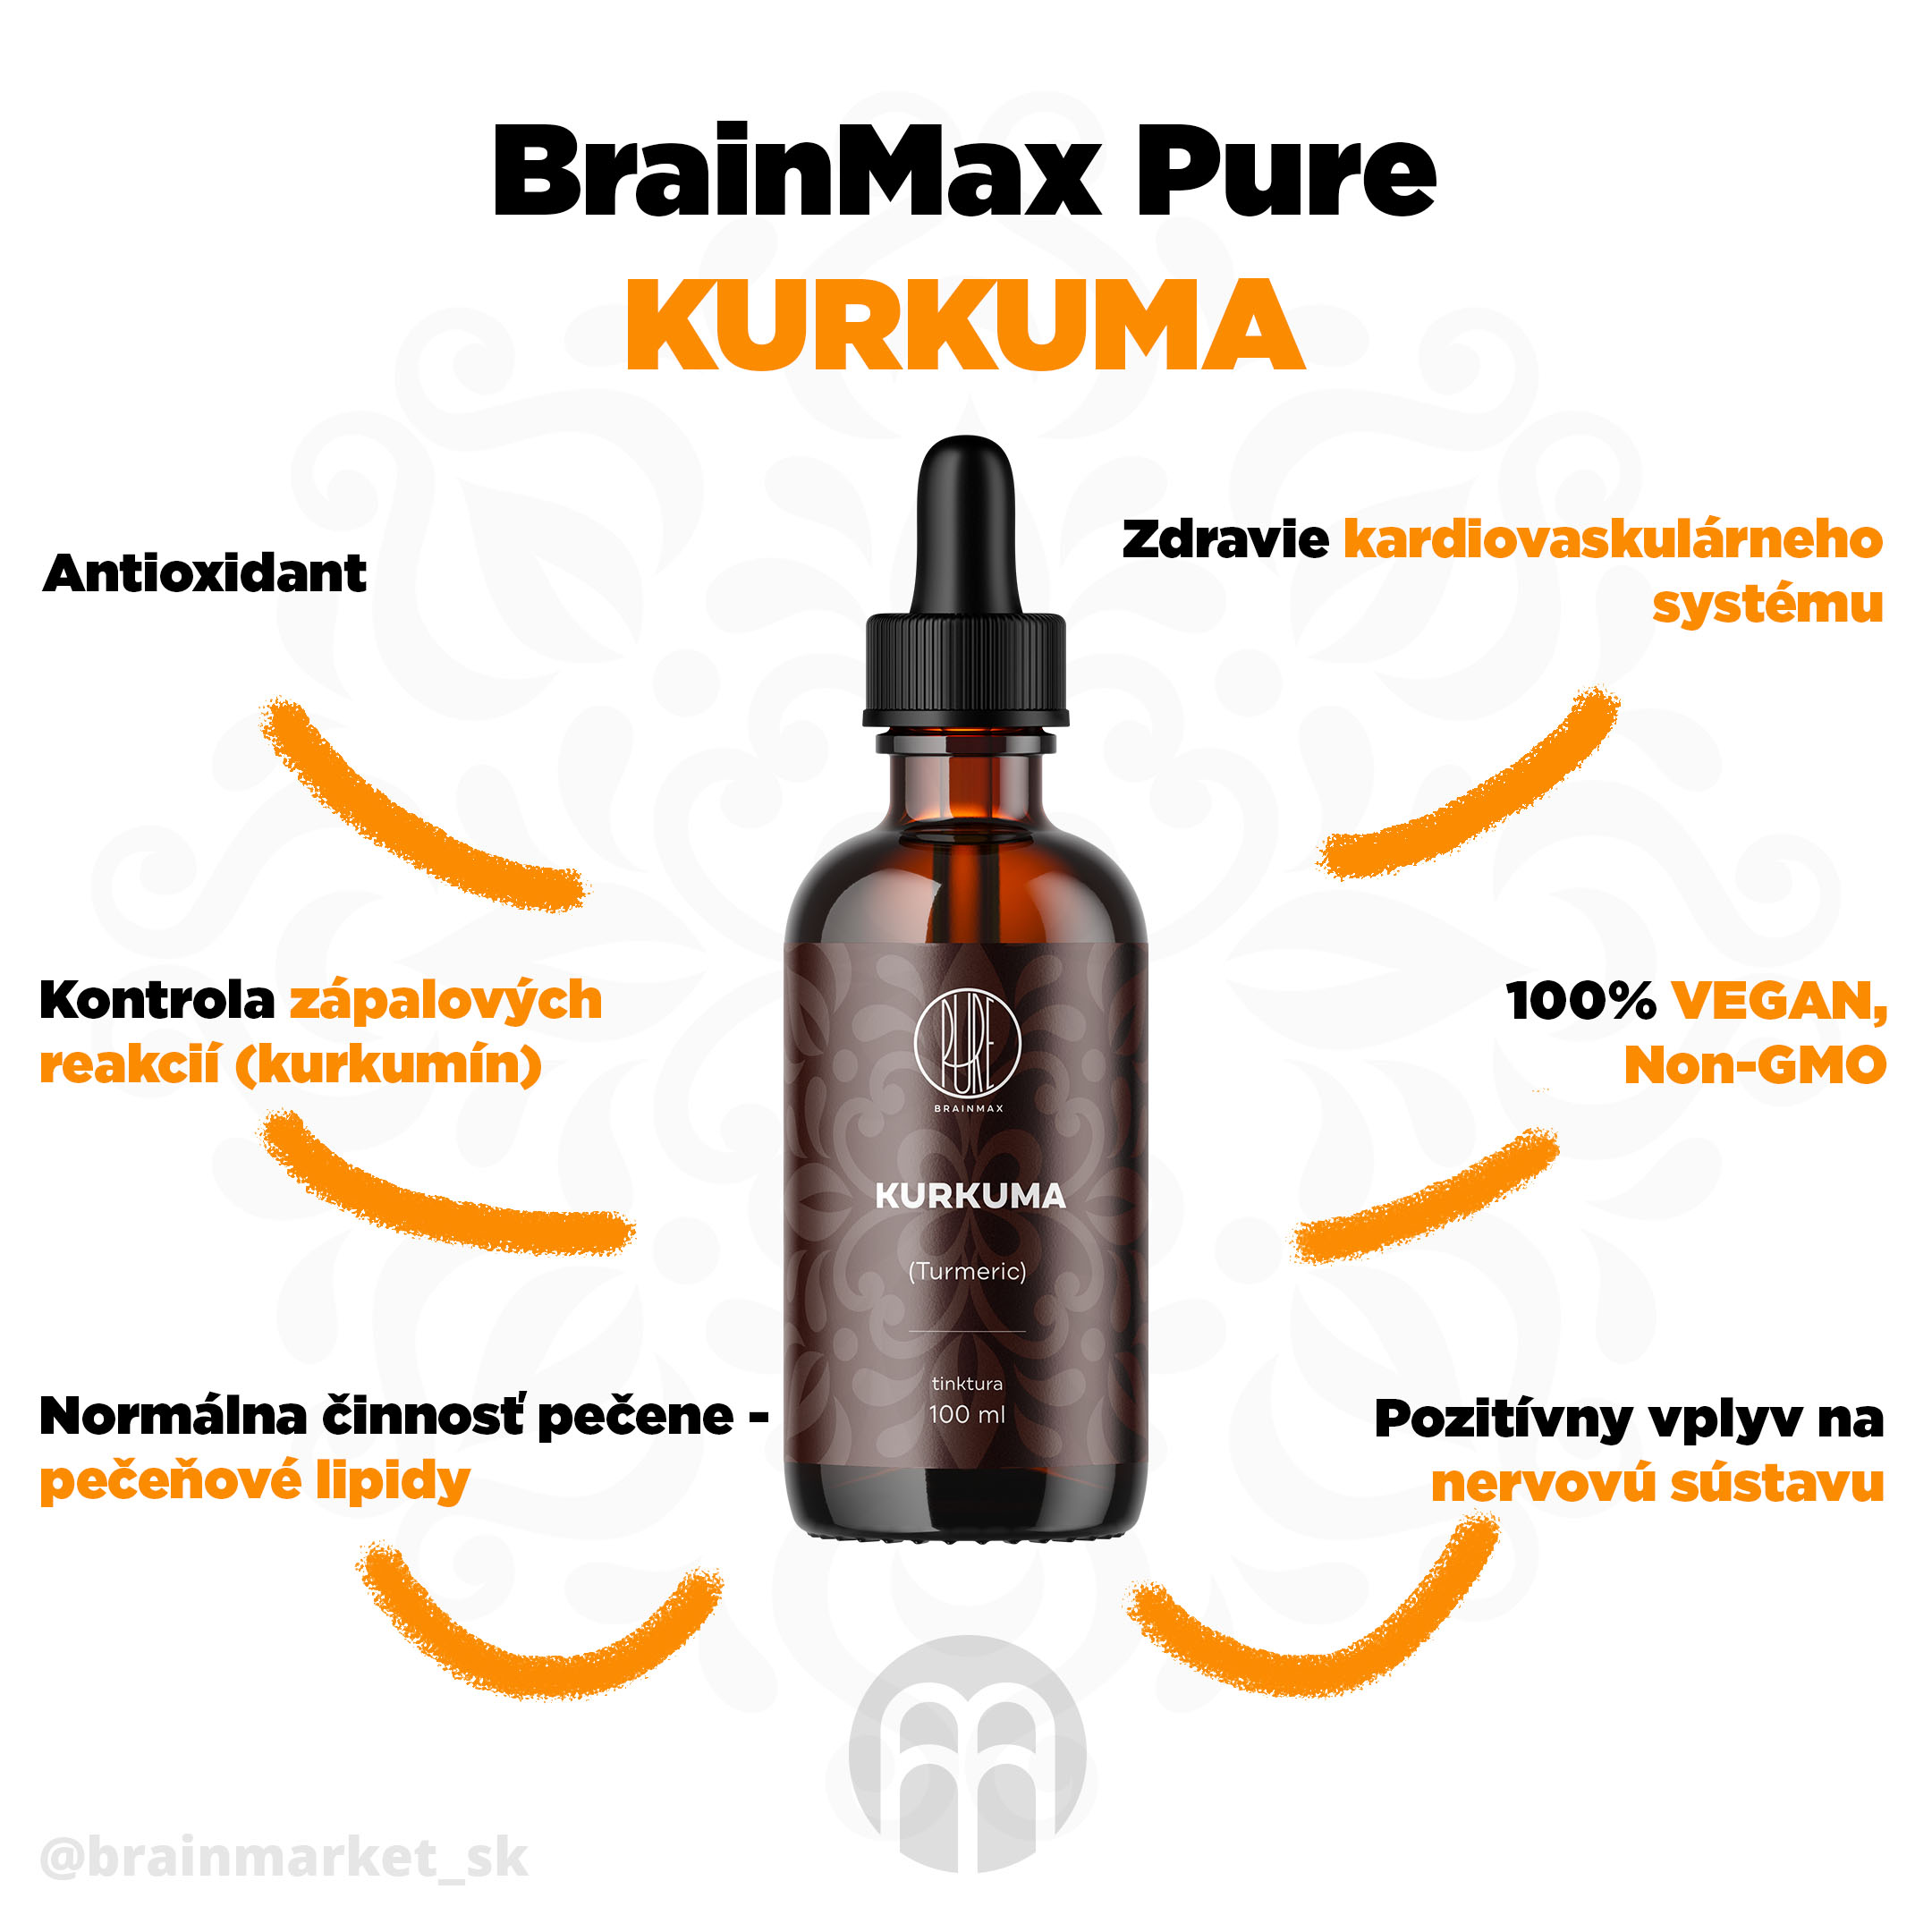 kurkuma_infografika_brainmarket_sk